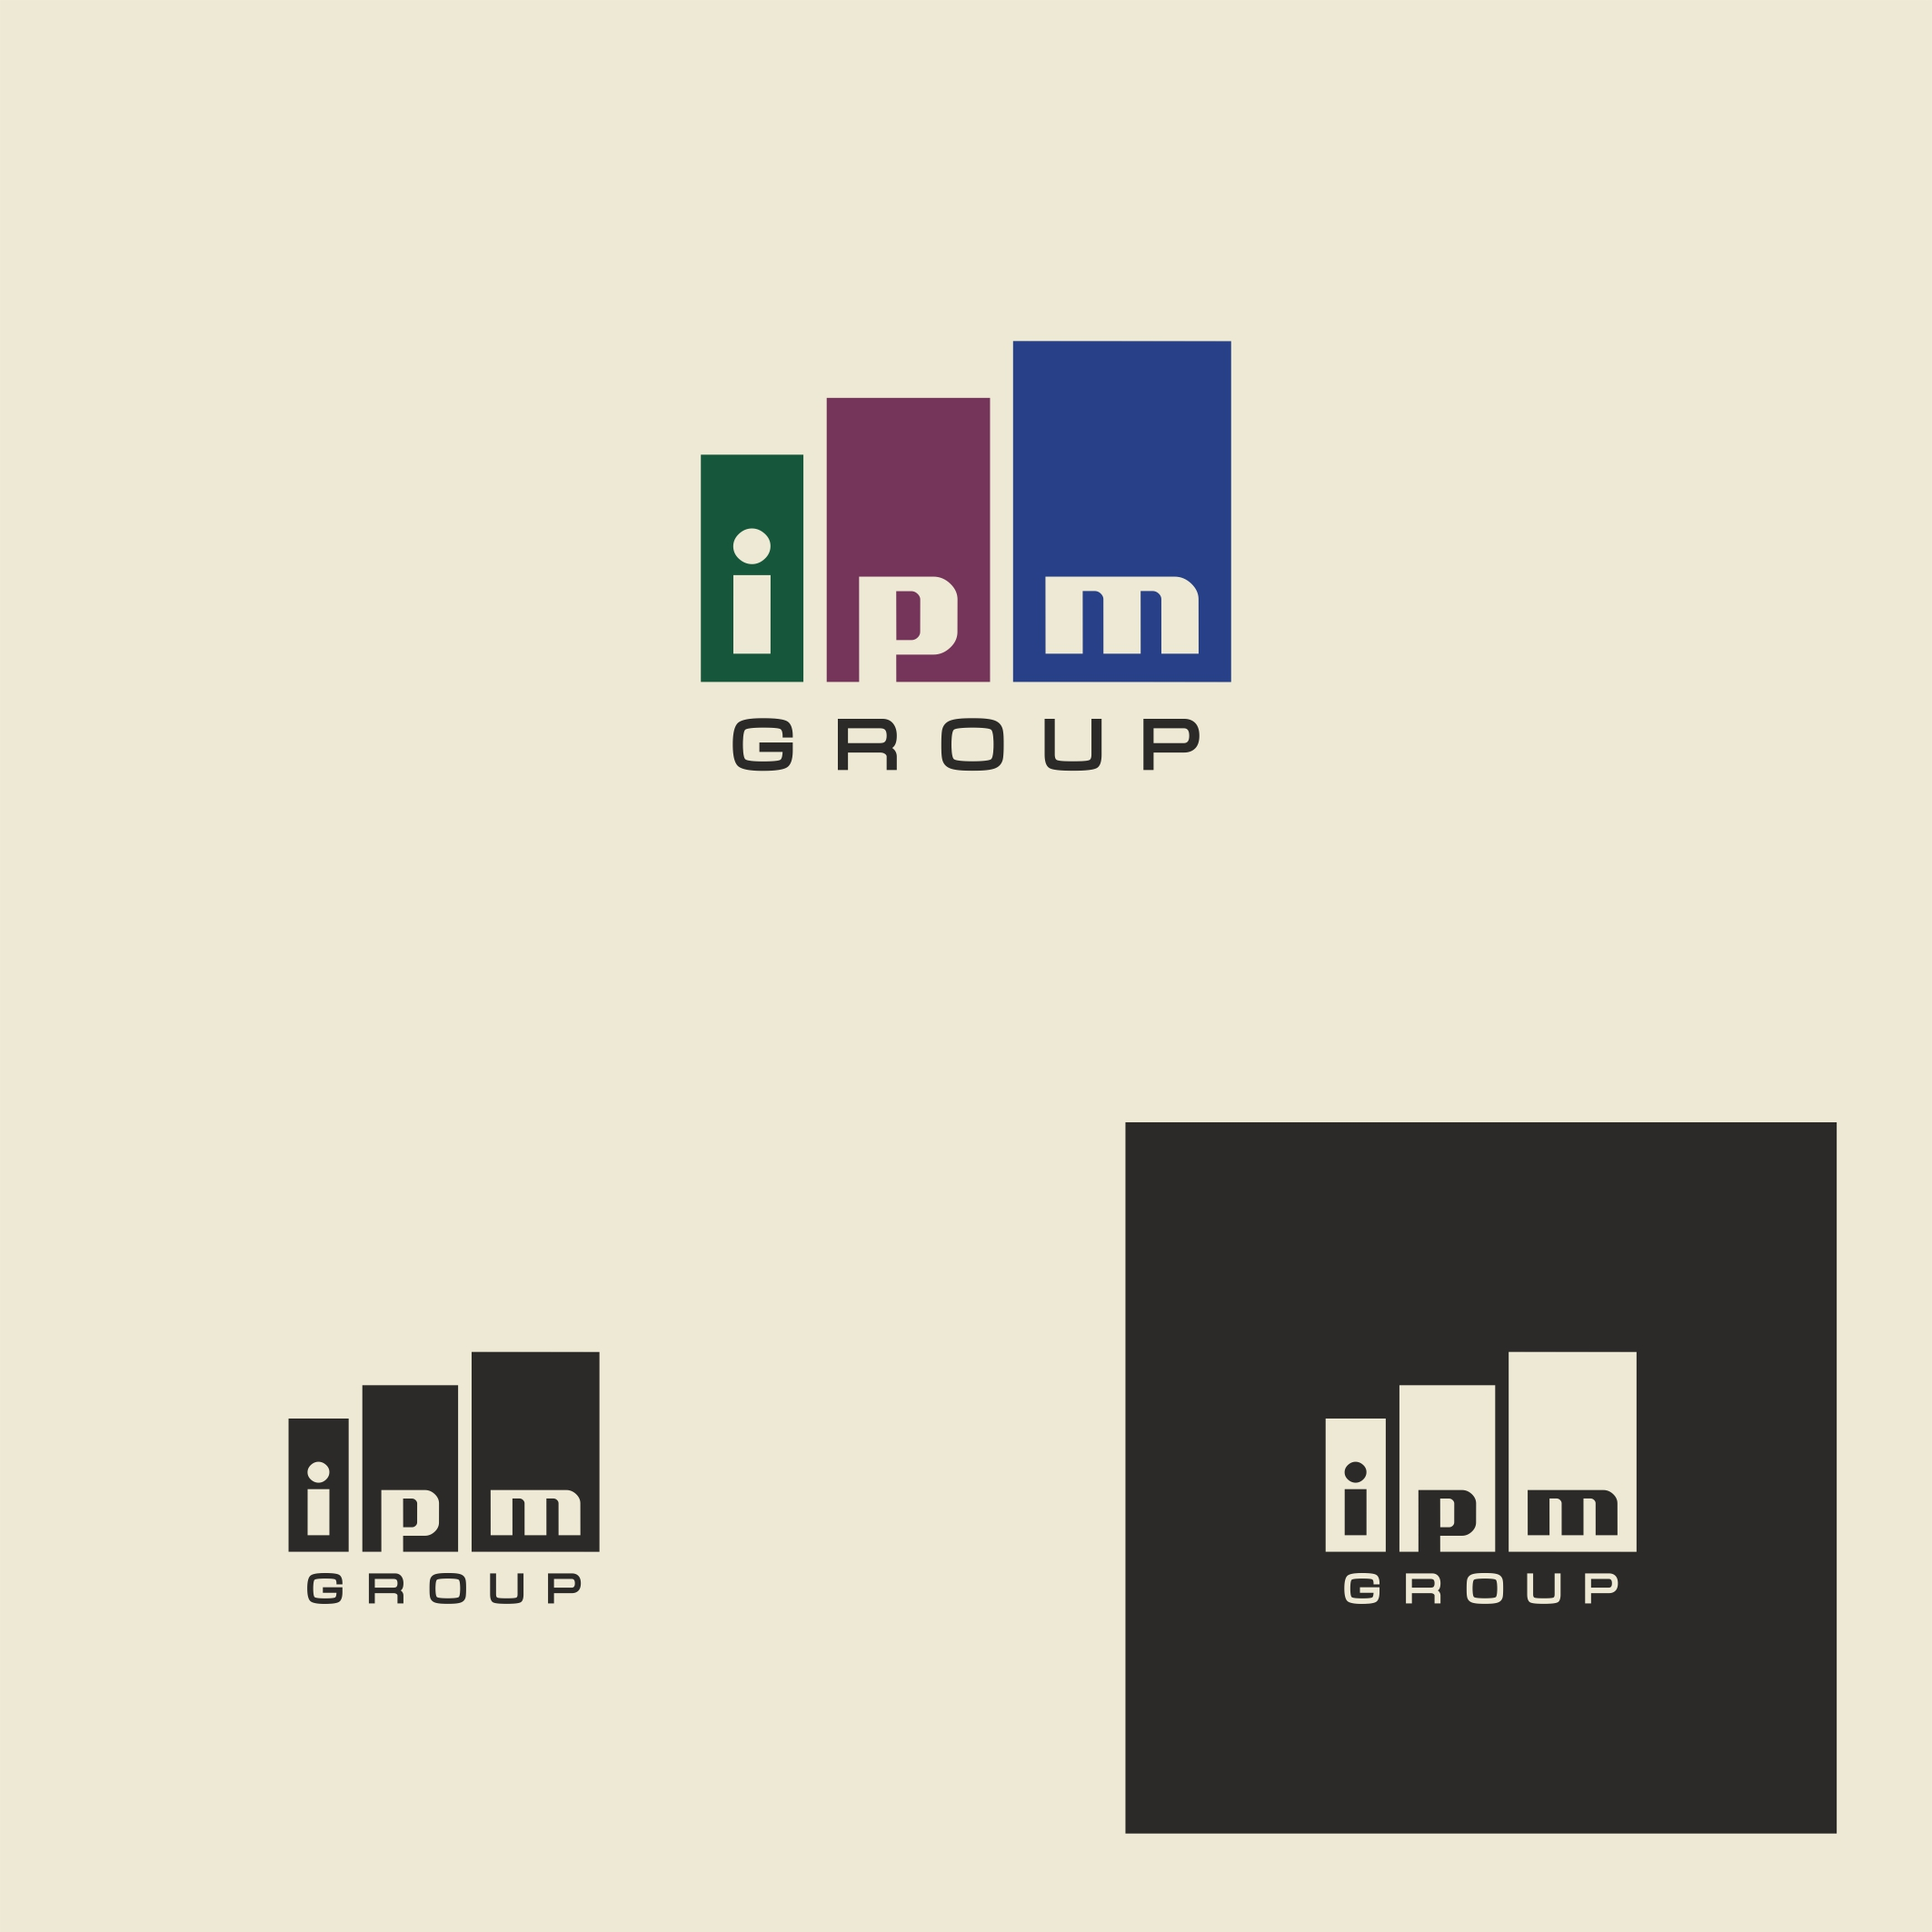 Разработка логотипа для управляющей компании фото f_4405f8373d550447.jpg